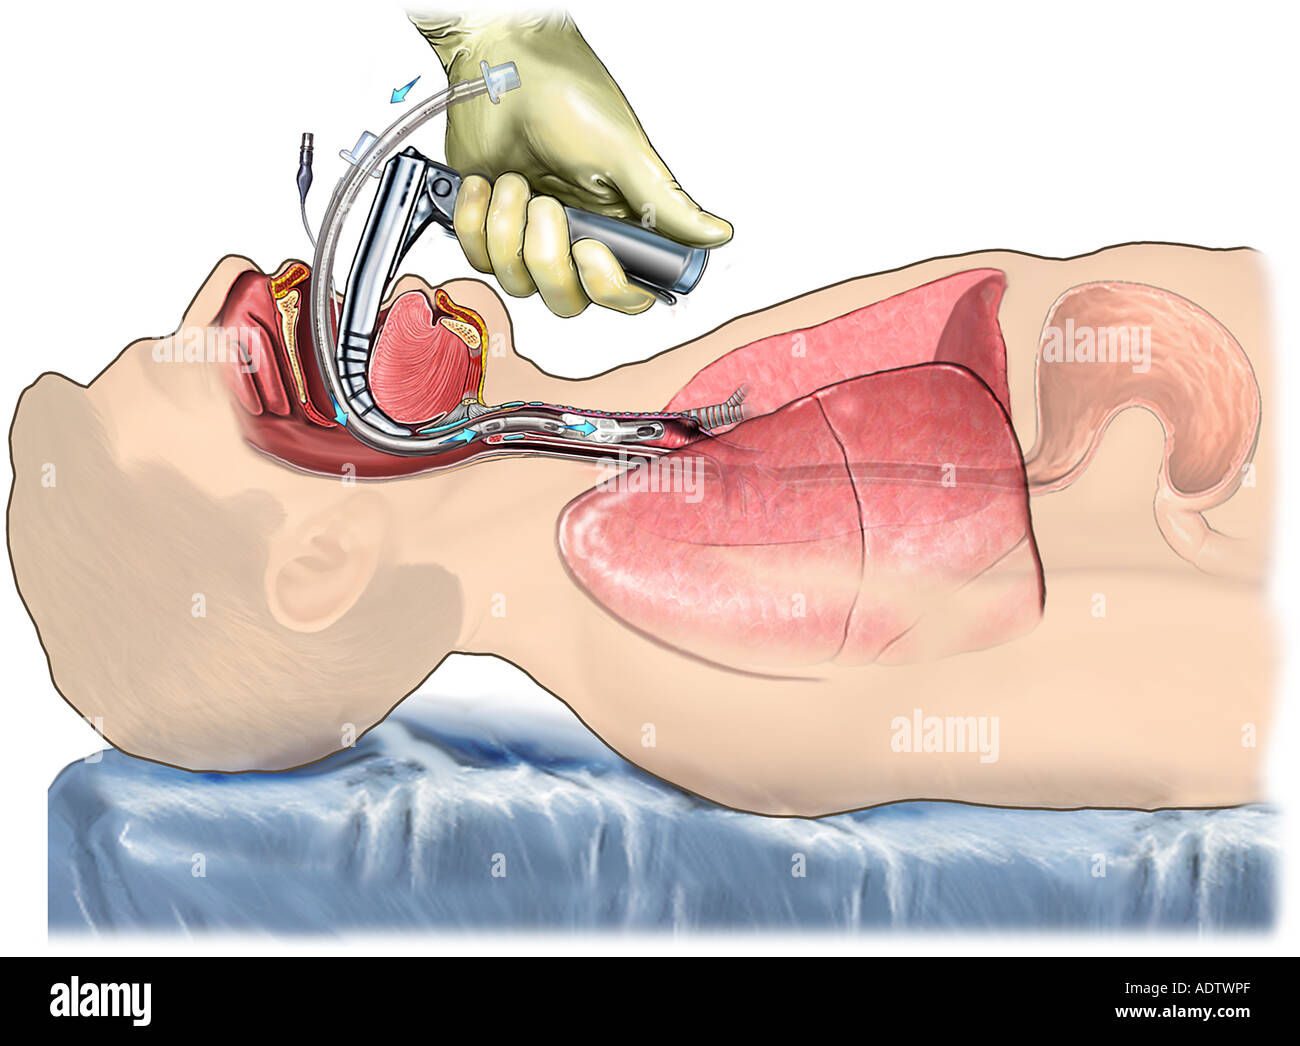 Proper Laryngoscopic Endotracheal Intubation Stock Photo 7710510